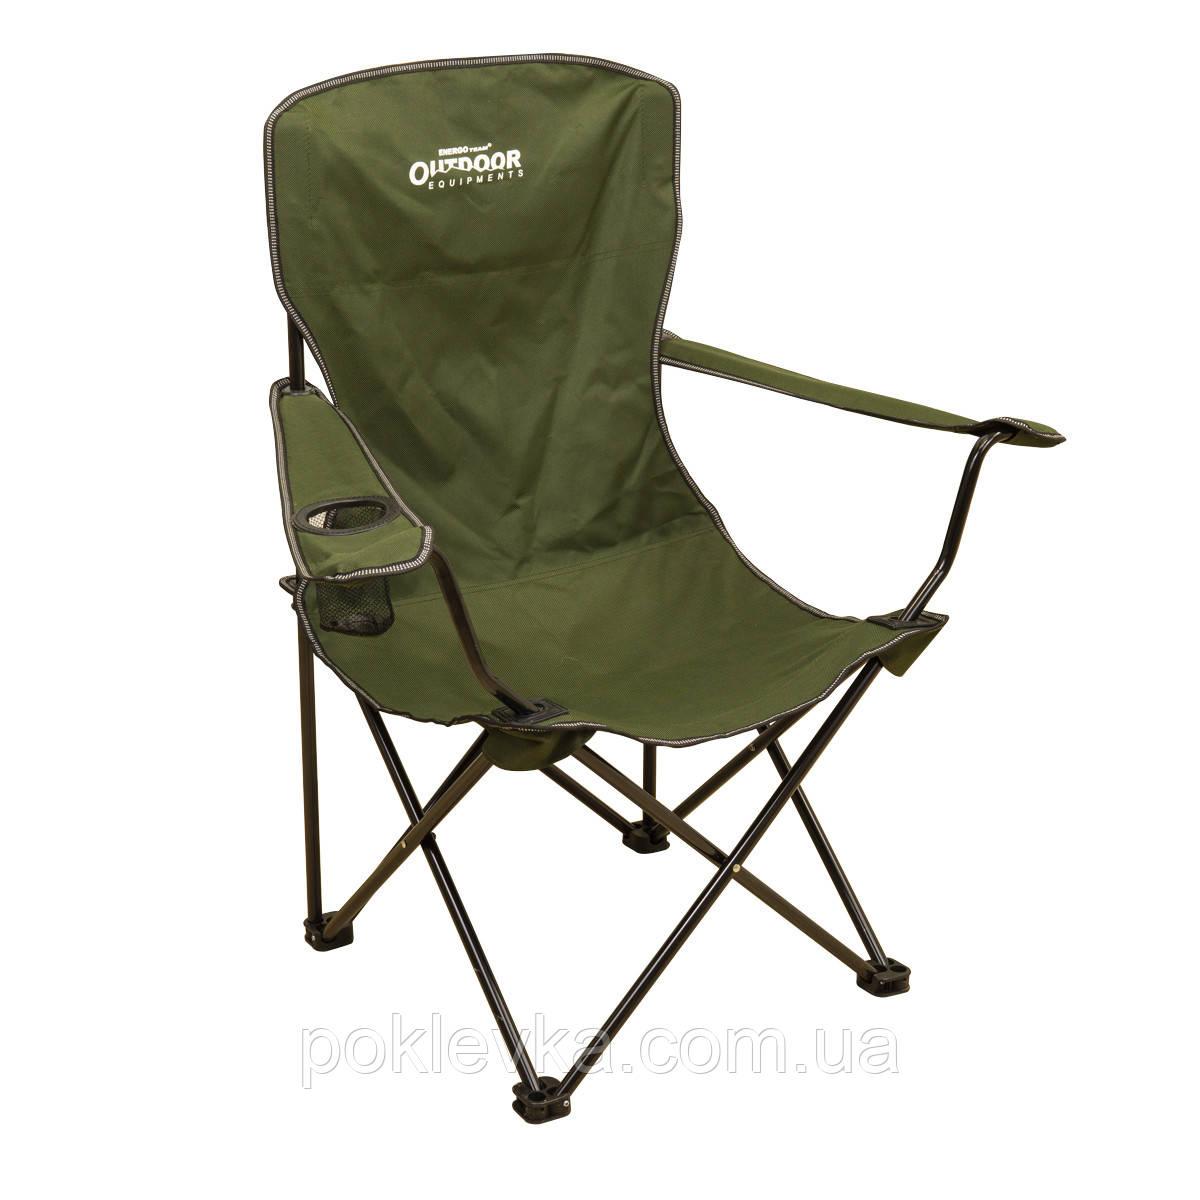 Кресло с подлокотником ET OUTDOOR ELEGANT CHAIR 74х53х96 см